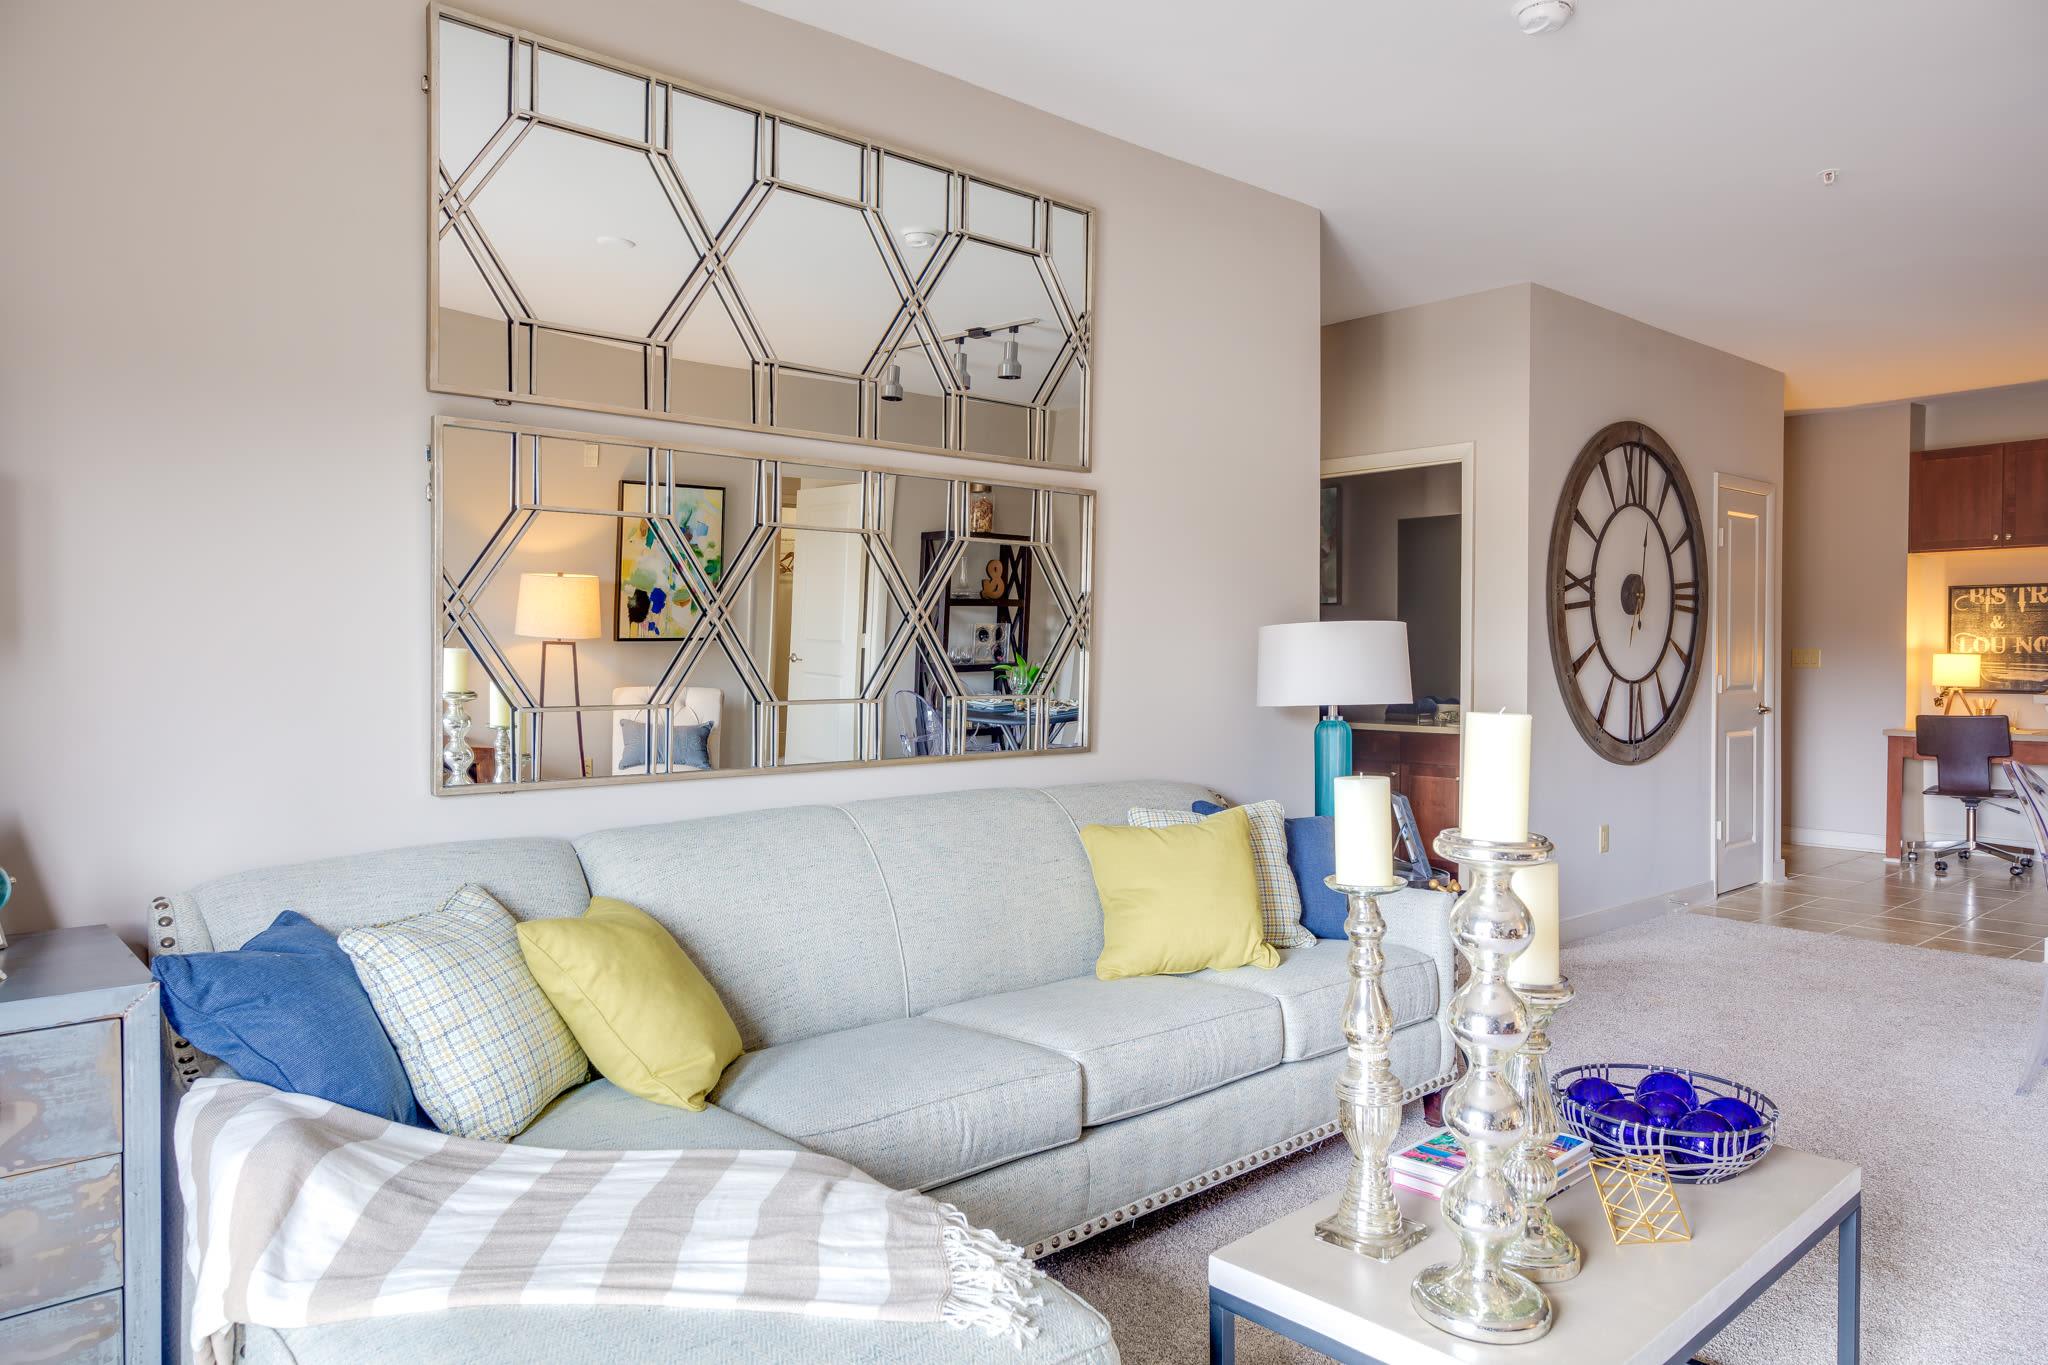 Model living room at McBee Station in Greenville, South Carolina